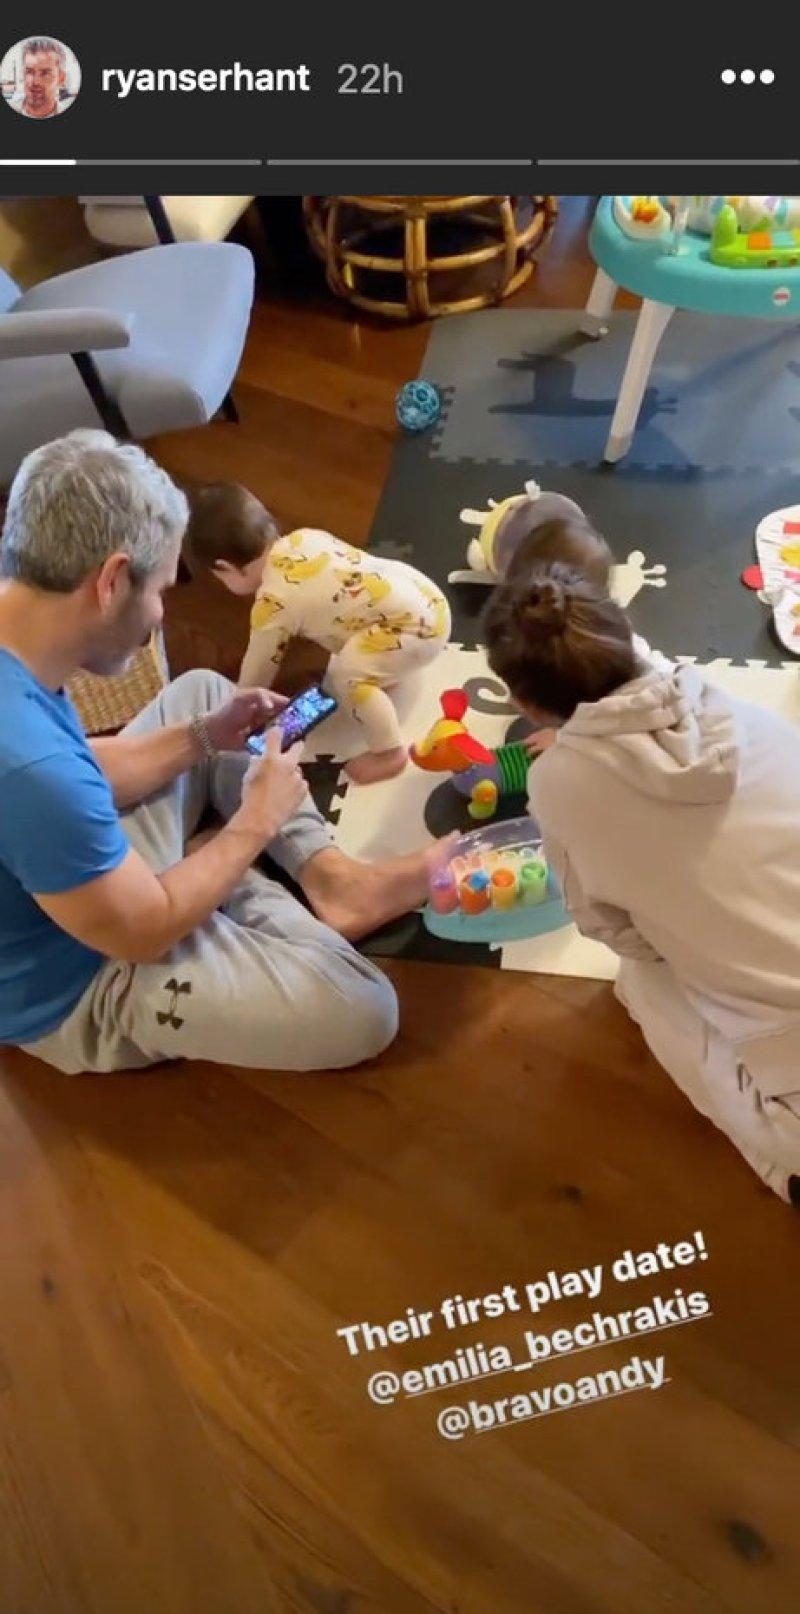 andy-cohen-ryan-serhant-children-playdate-02